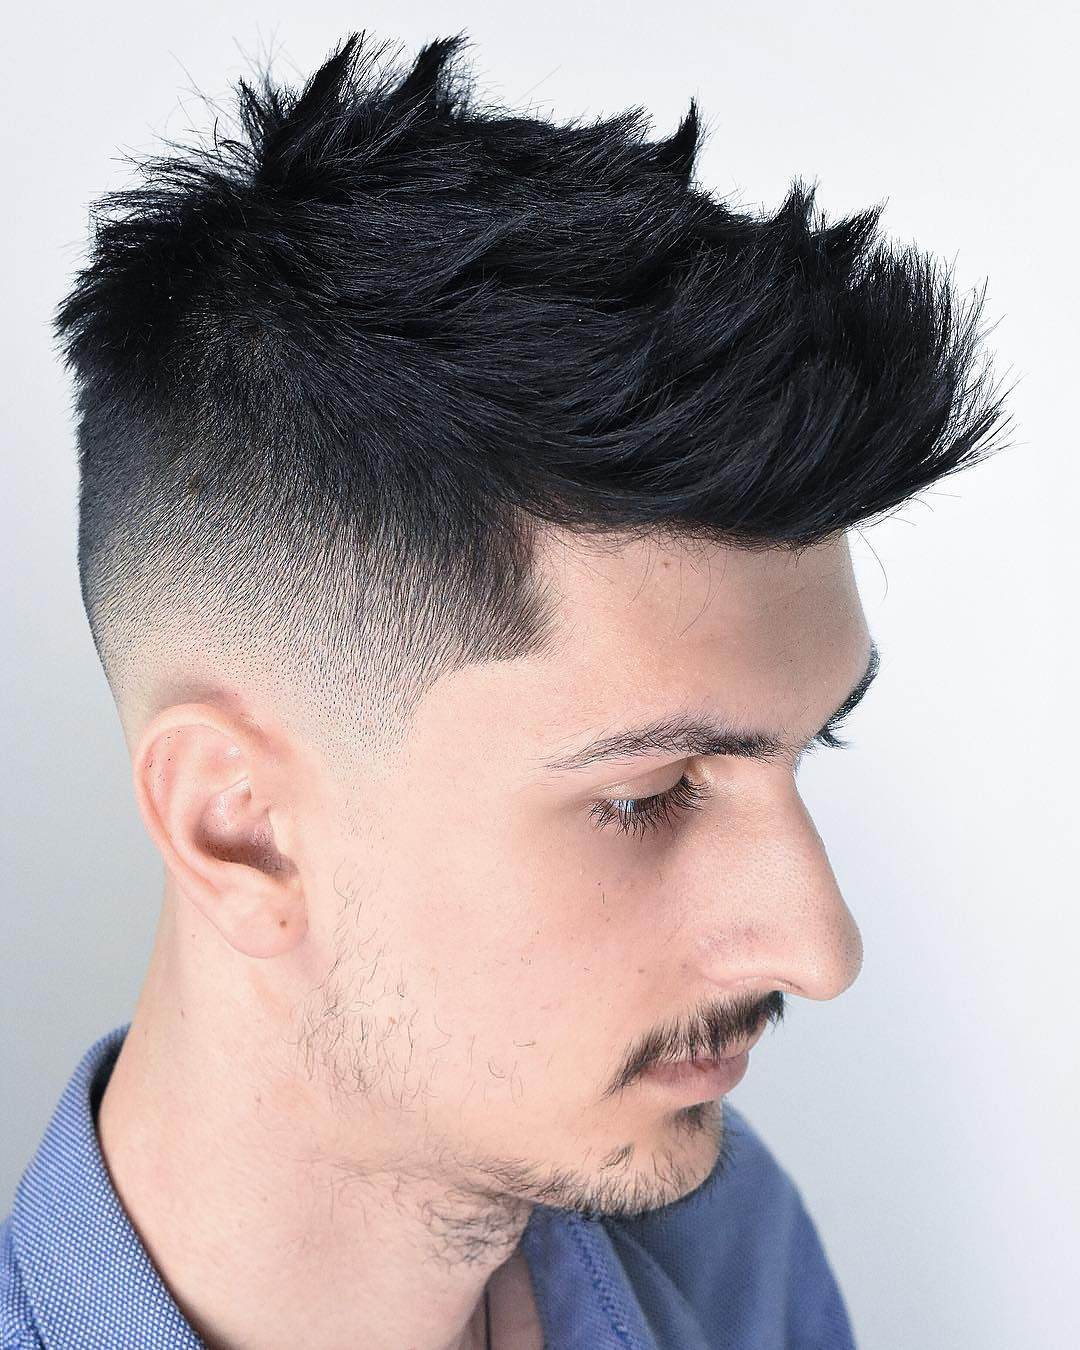 40 Simple Regular Clean Cut Haircuts For Men Mens Hairstyles